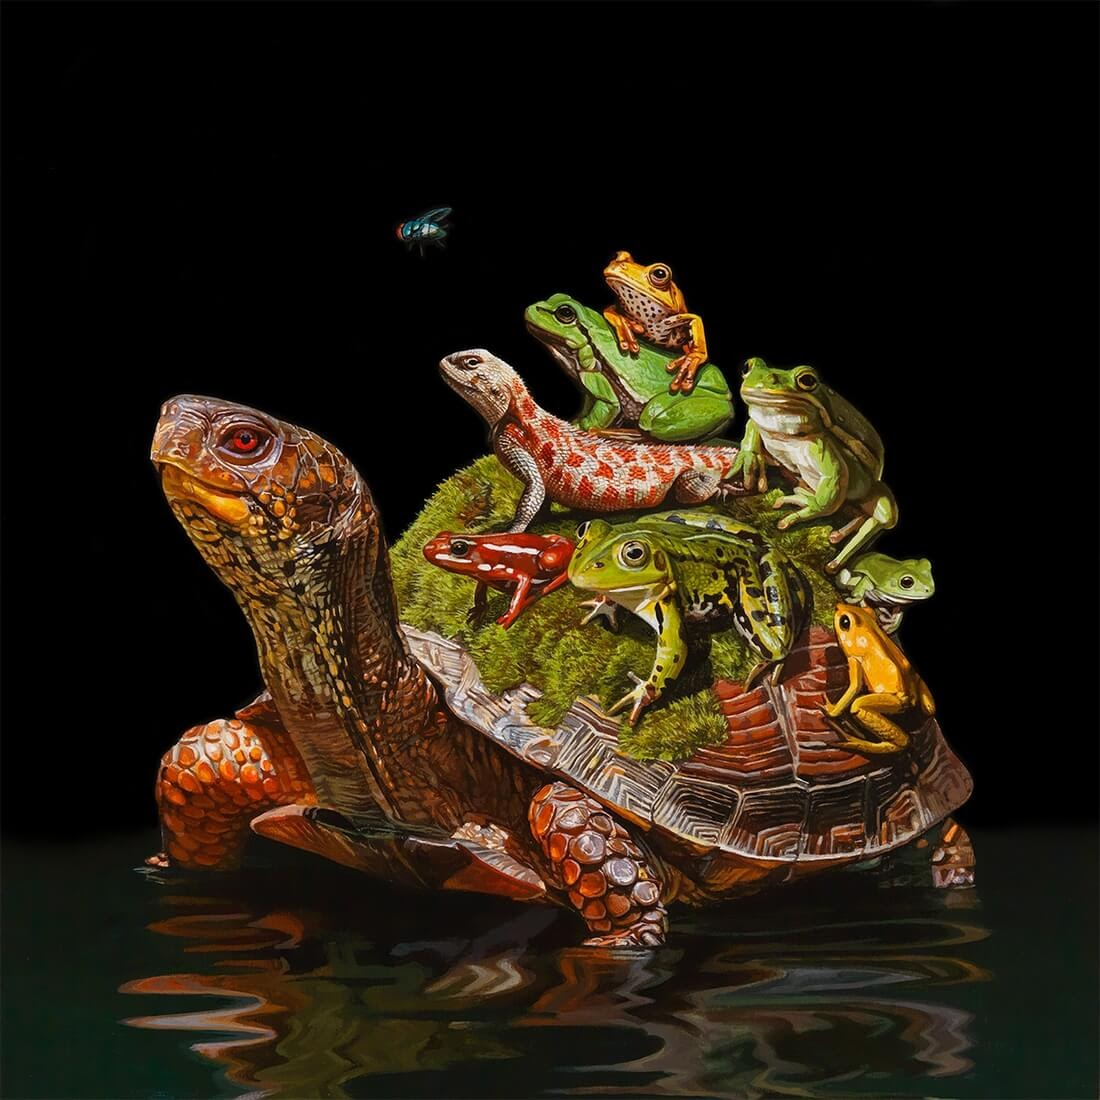 01-Oasis-Lisa-Ericson-Animals-Interspecies-Friendships-Paintings-www-designstack-co